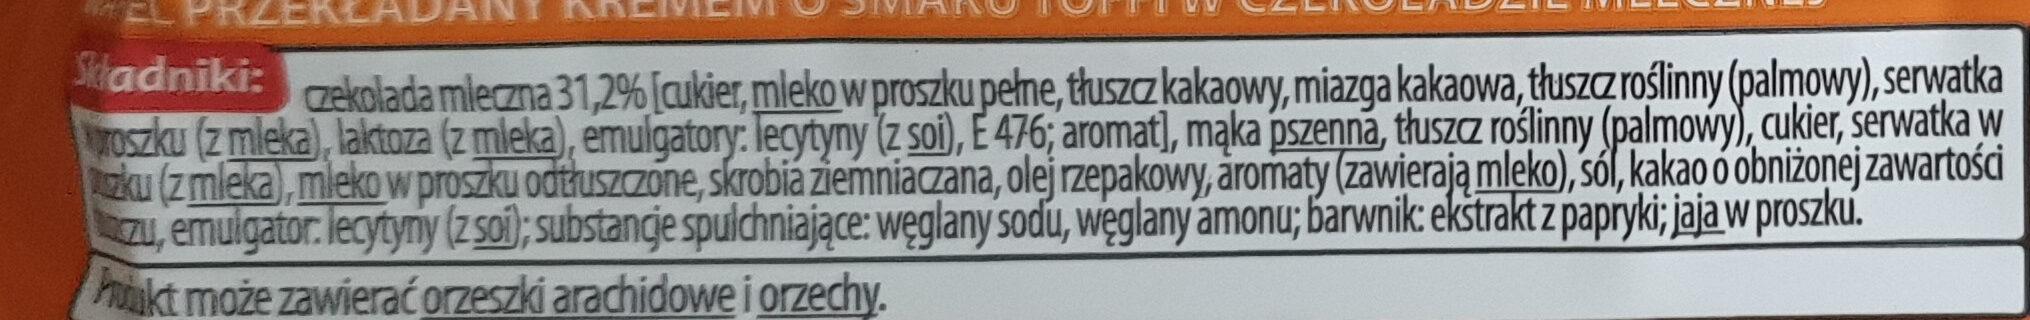 Estella o smaku toffi - Ingrédients - pl